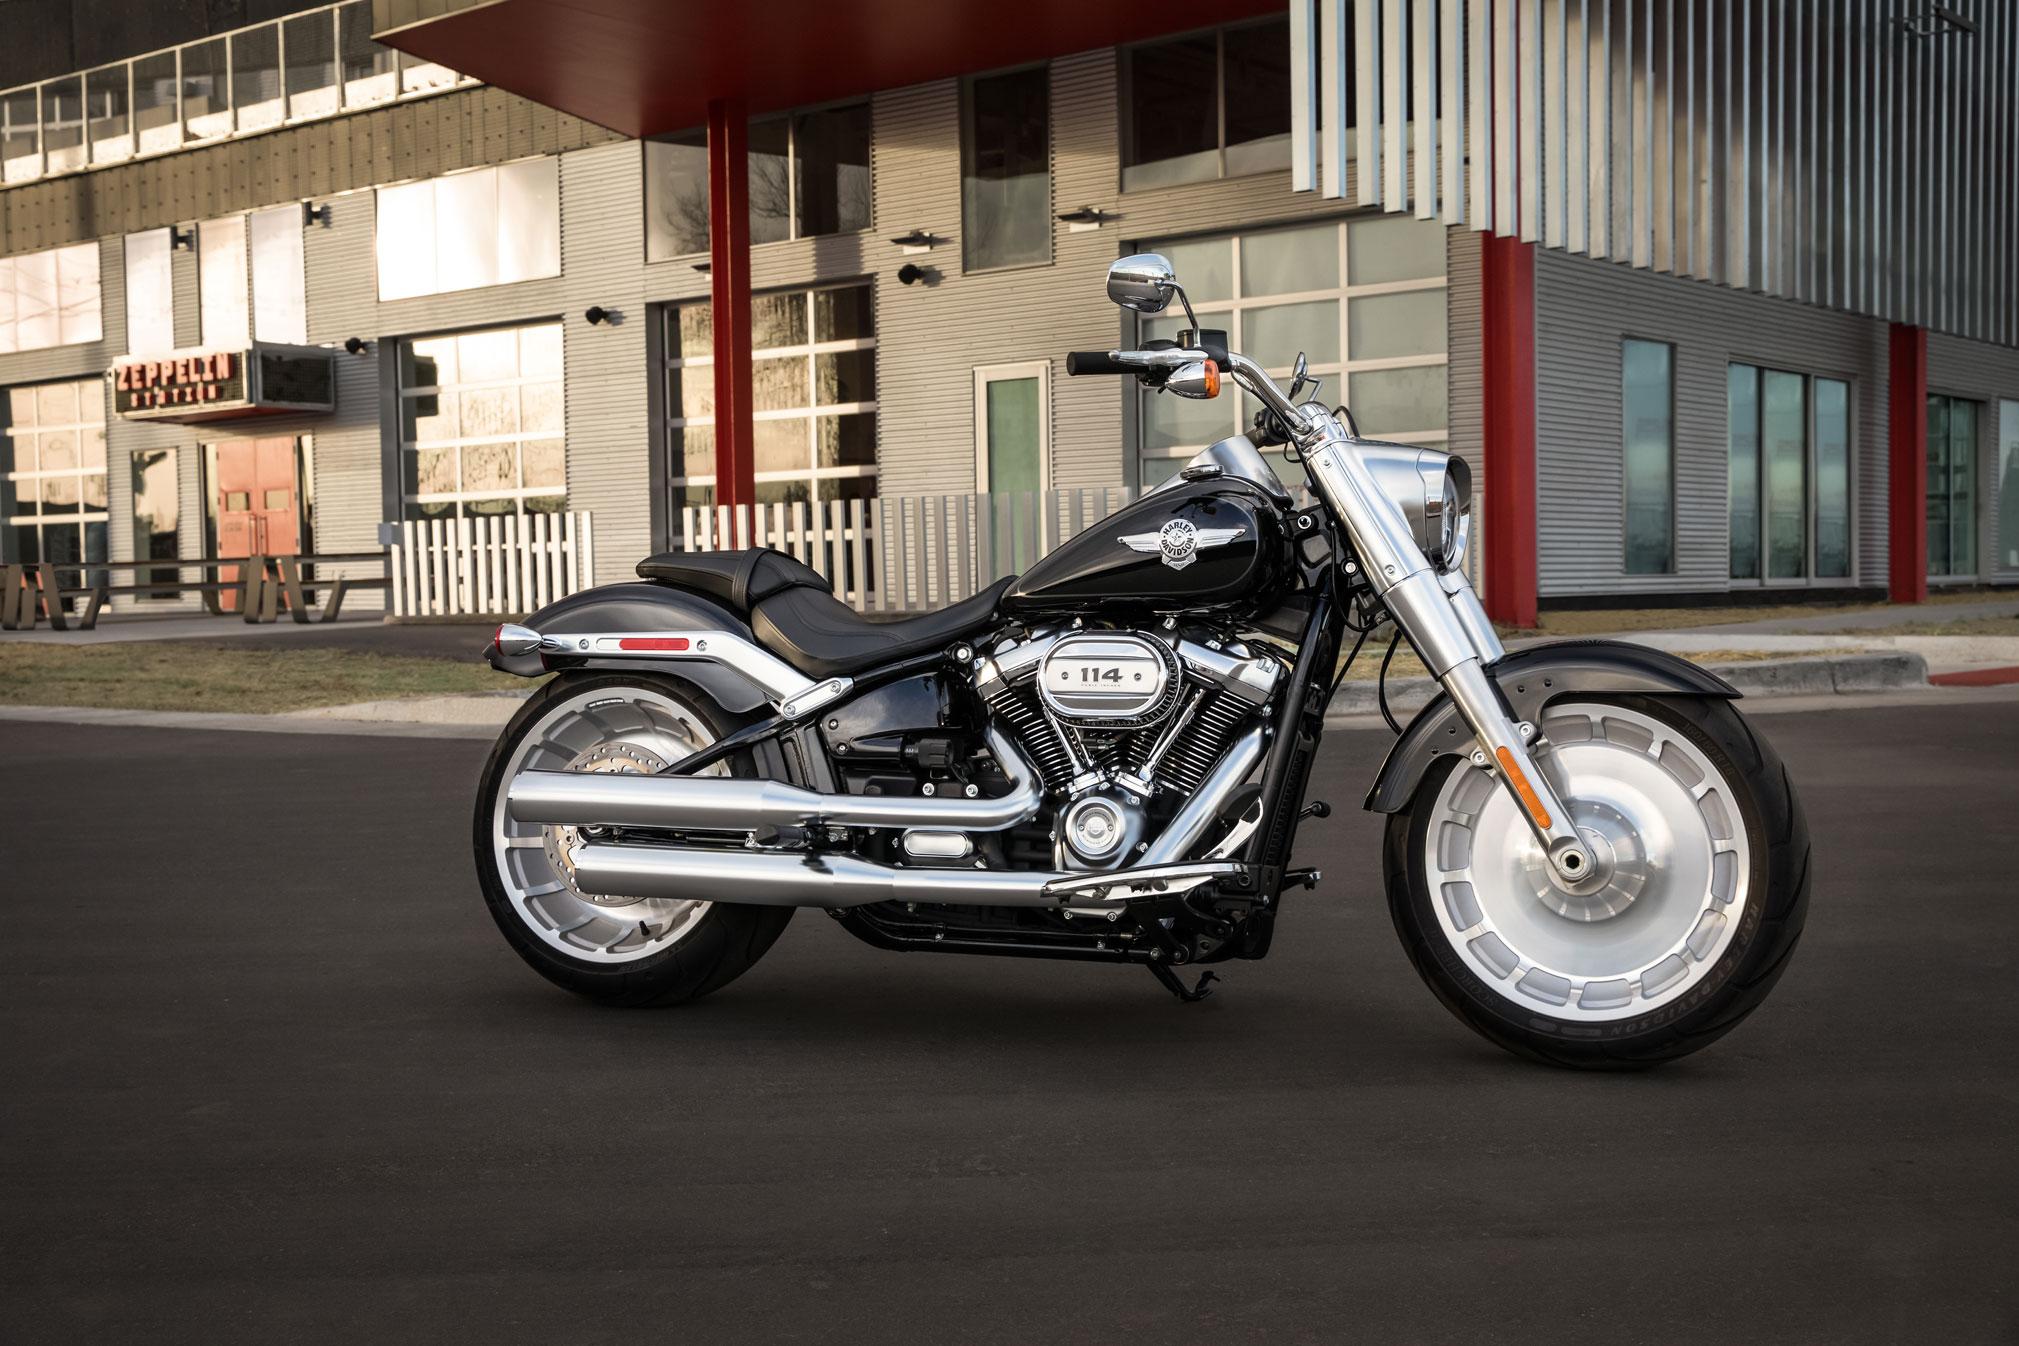 2019 Harley-Davidson Fat Boy 114 Guide • Total Motorcycle